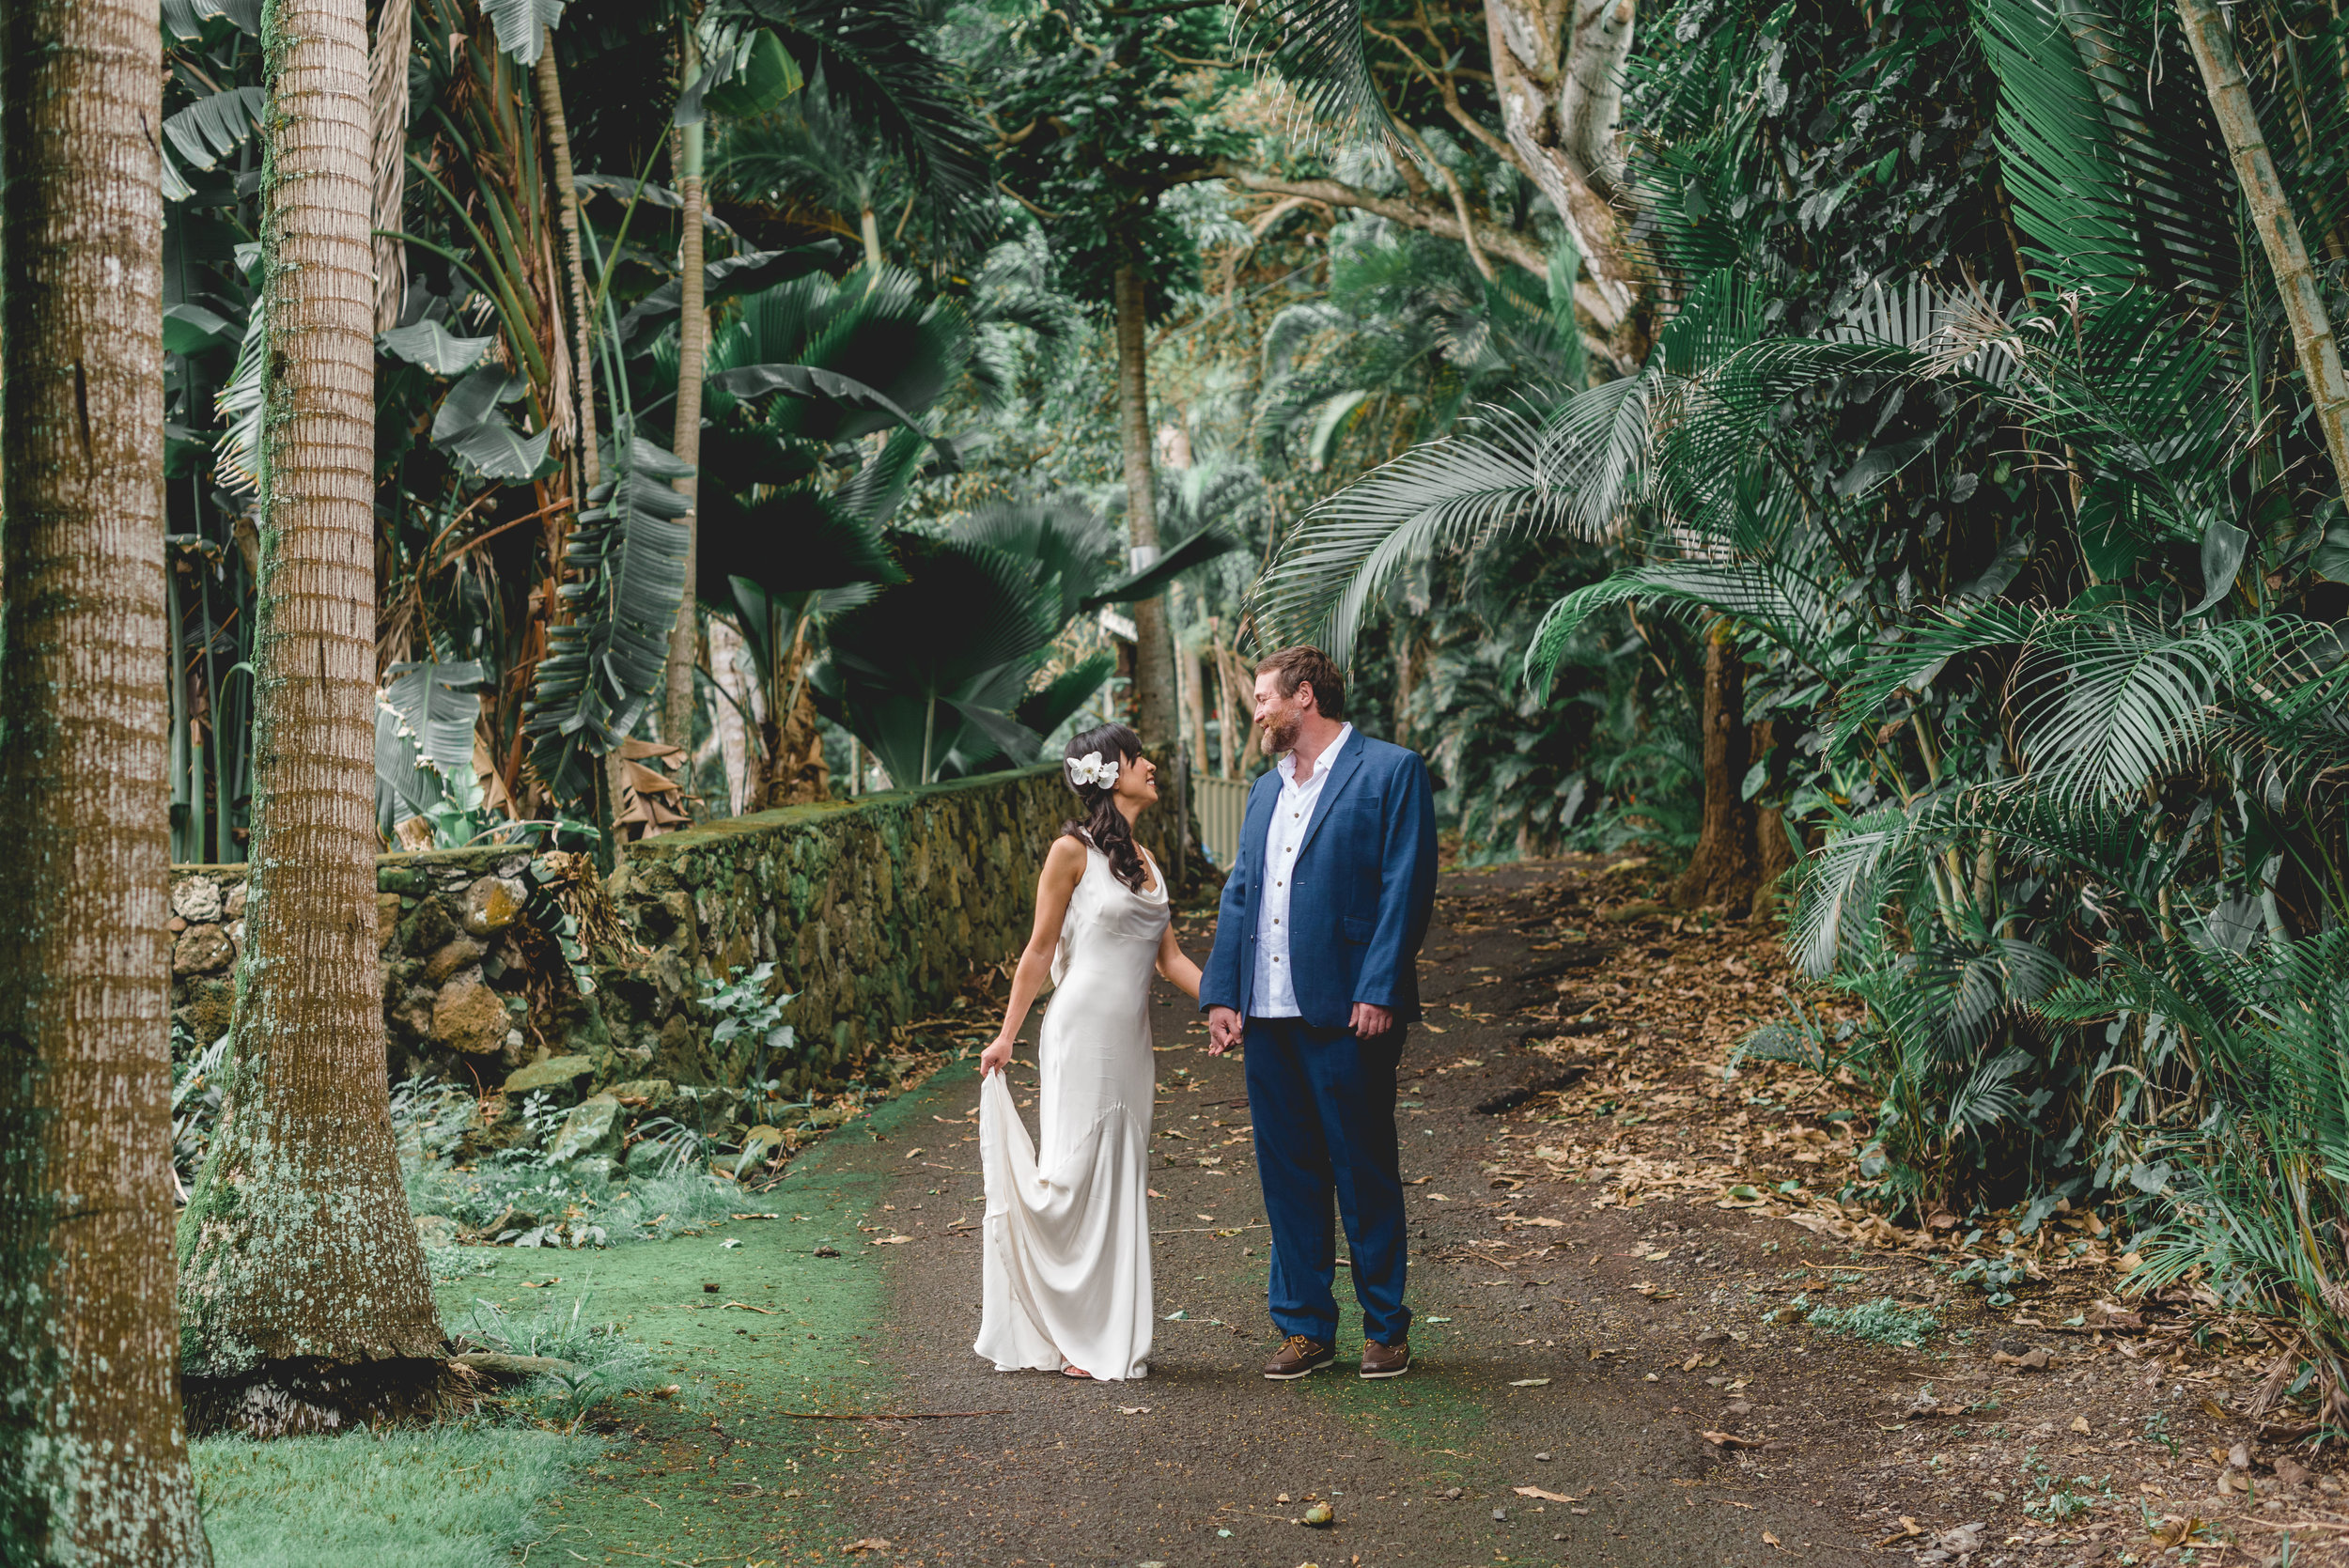 A Destination Wedding in Hawaii | One Photographer